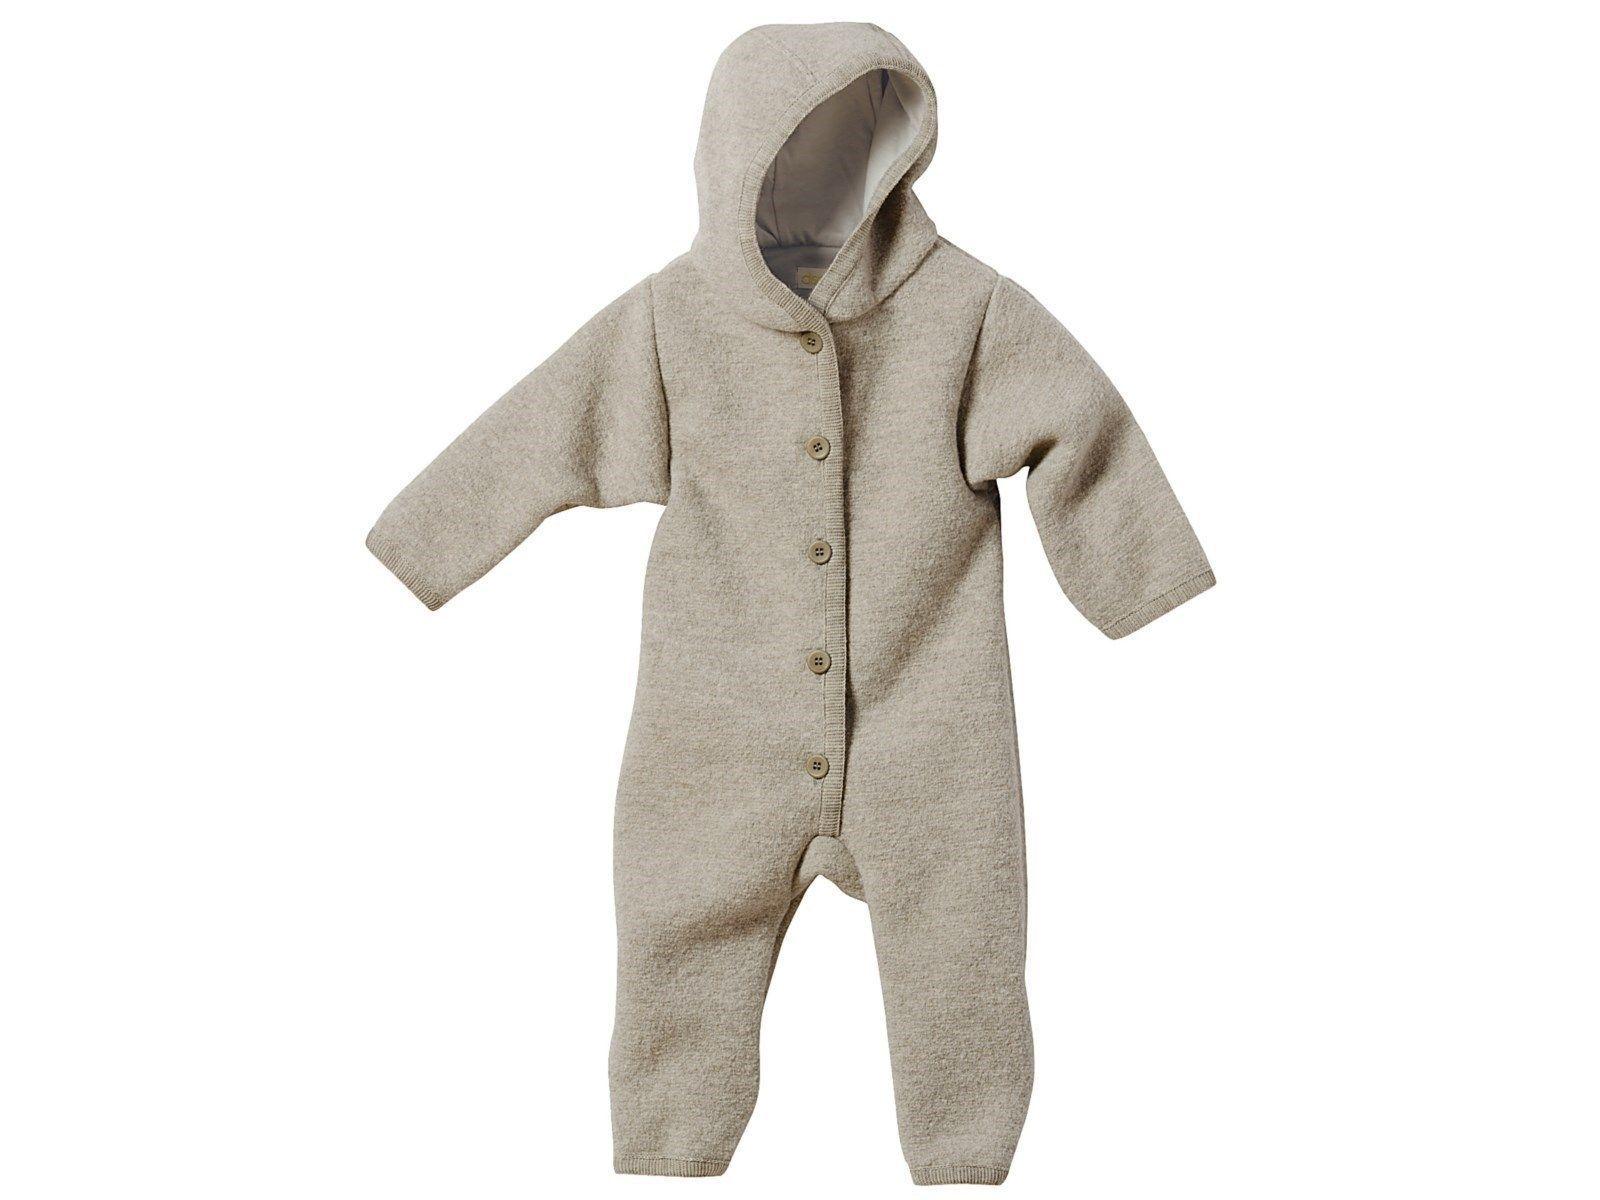 c1fce41c14da Maternity Kangaroo baby pocket Hoodie with Babies Carrier Women ...